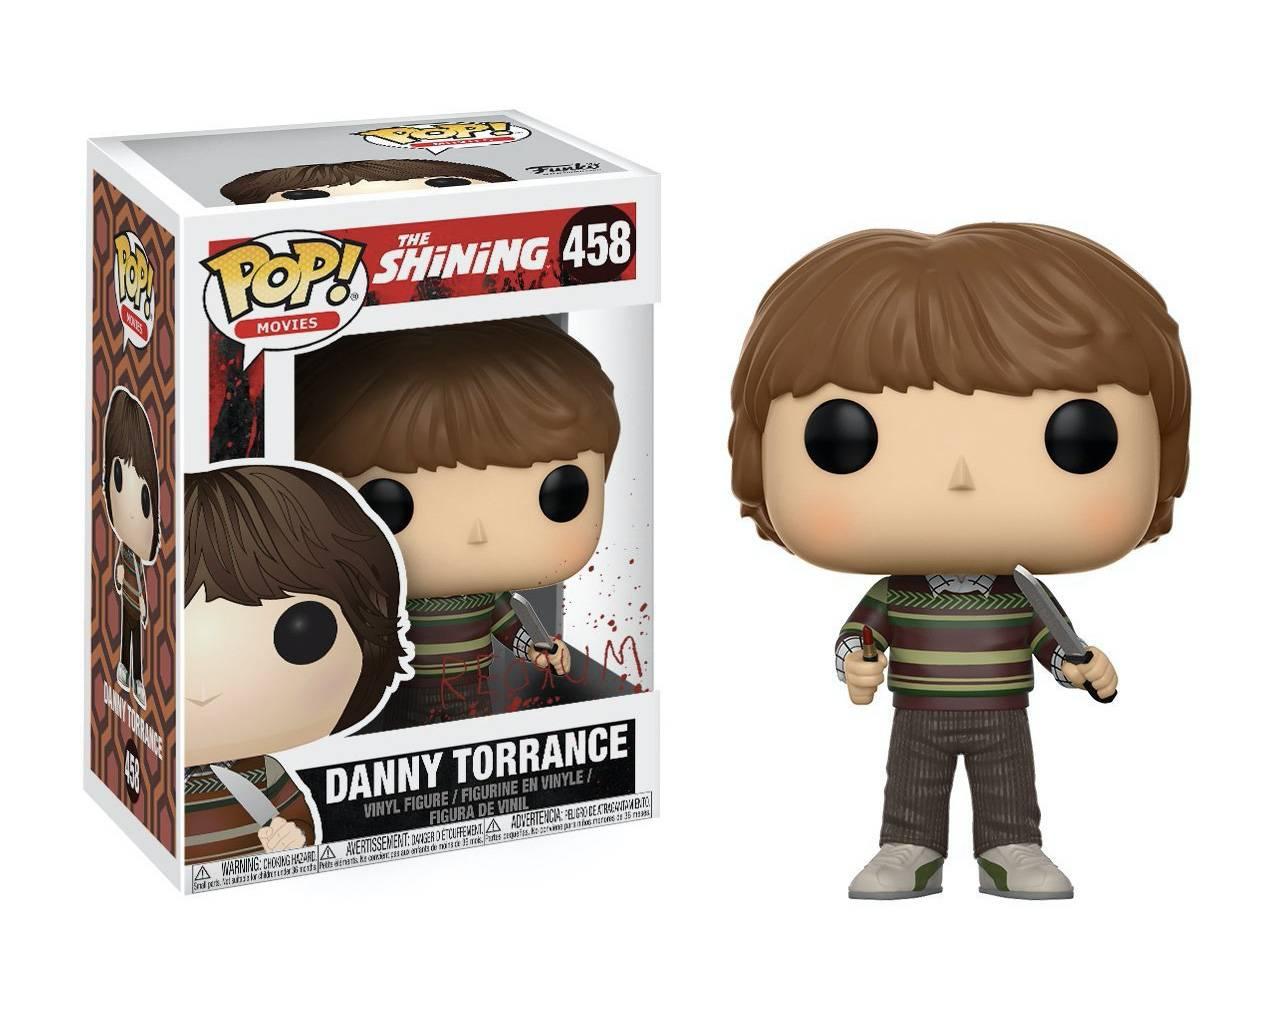 Danny Torrance Pop! Vinyl